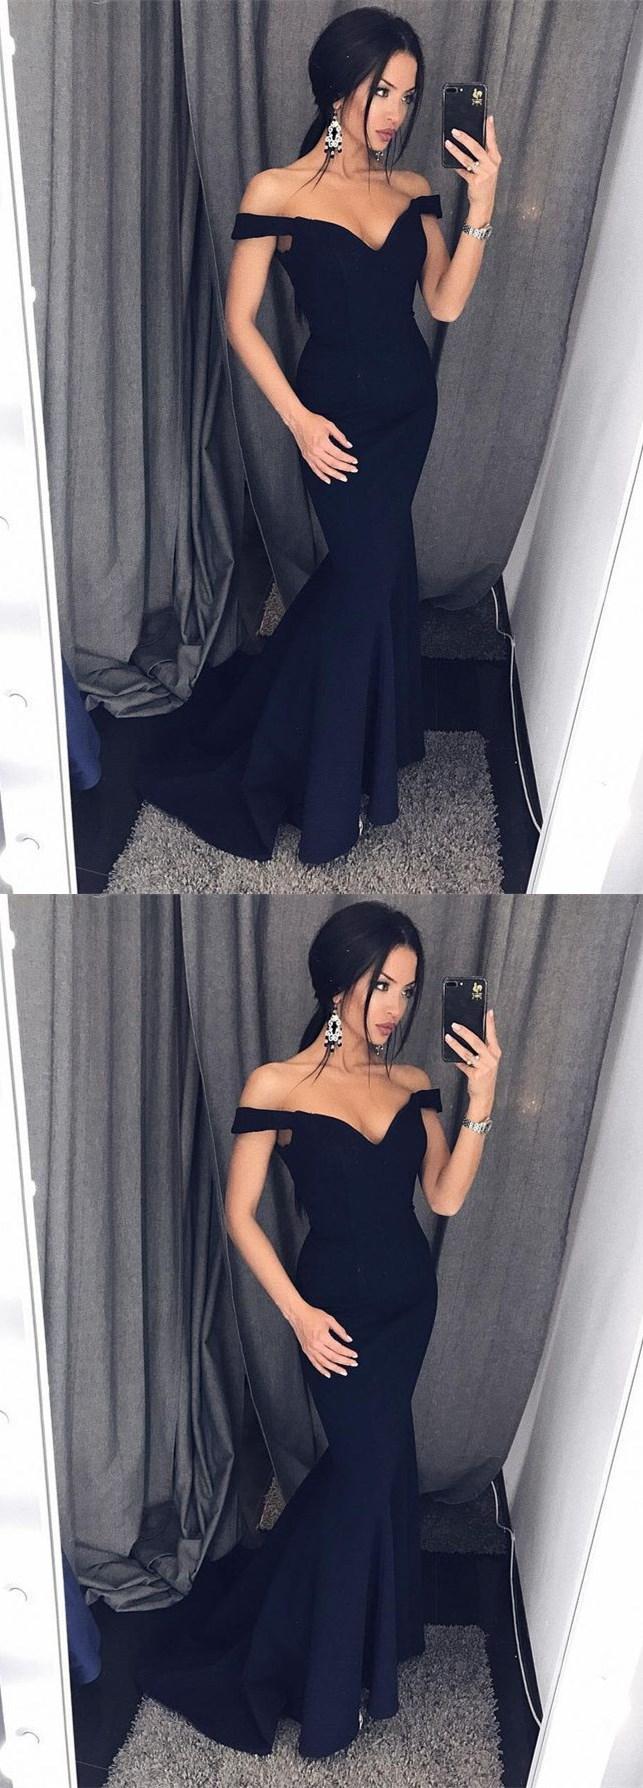 49b413730c Sexy Mermaid Off-Shoulder Black Satin Long Prom Dress Evening Dress LP151